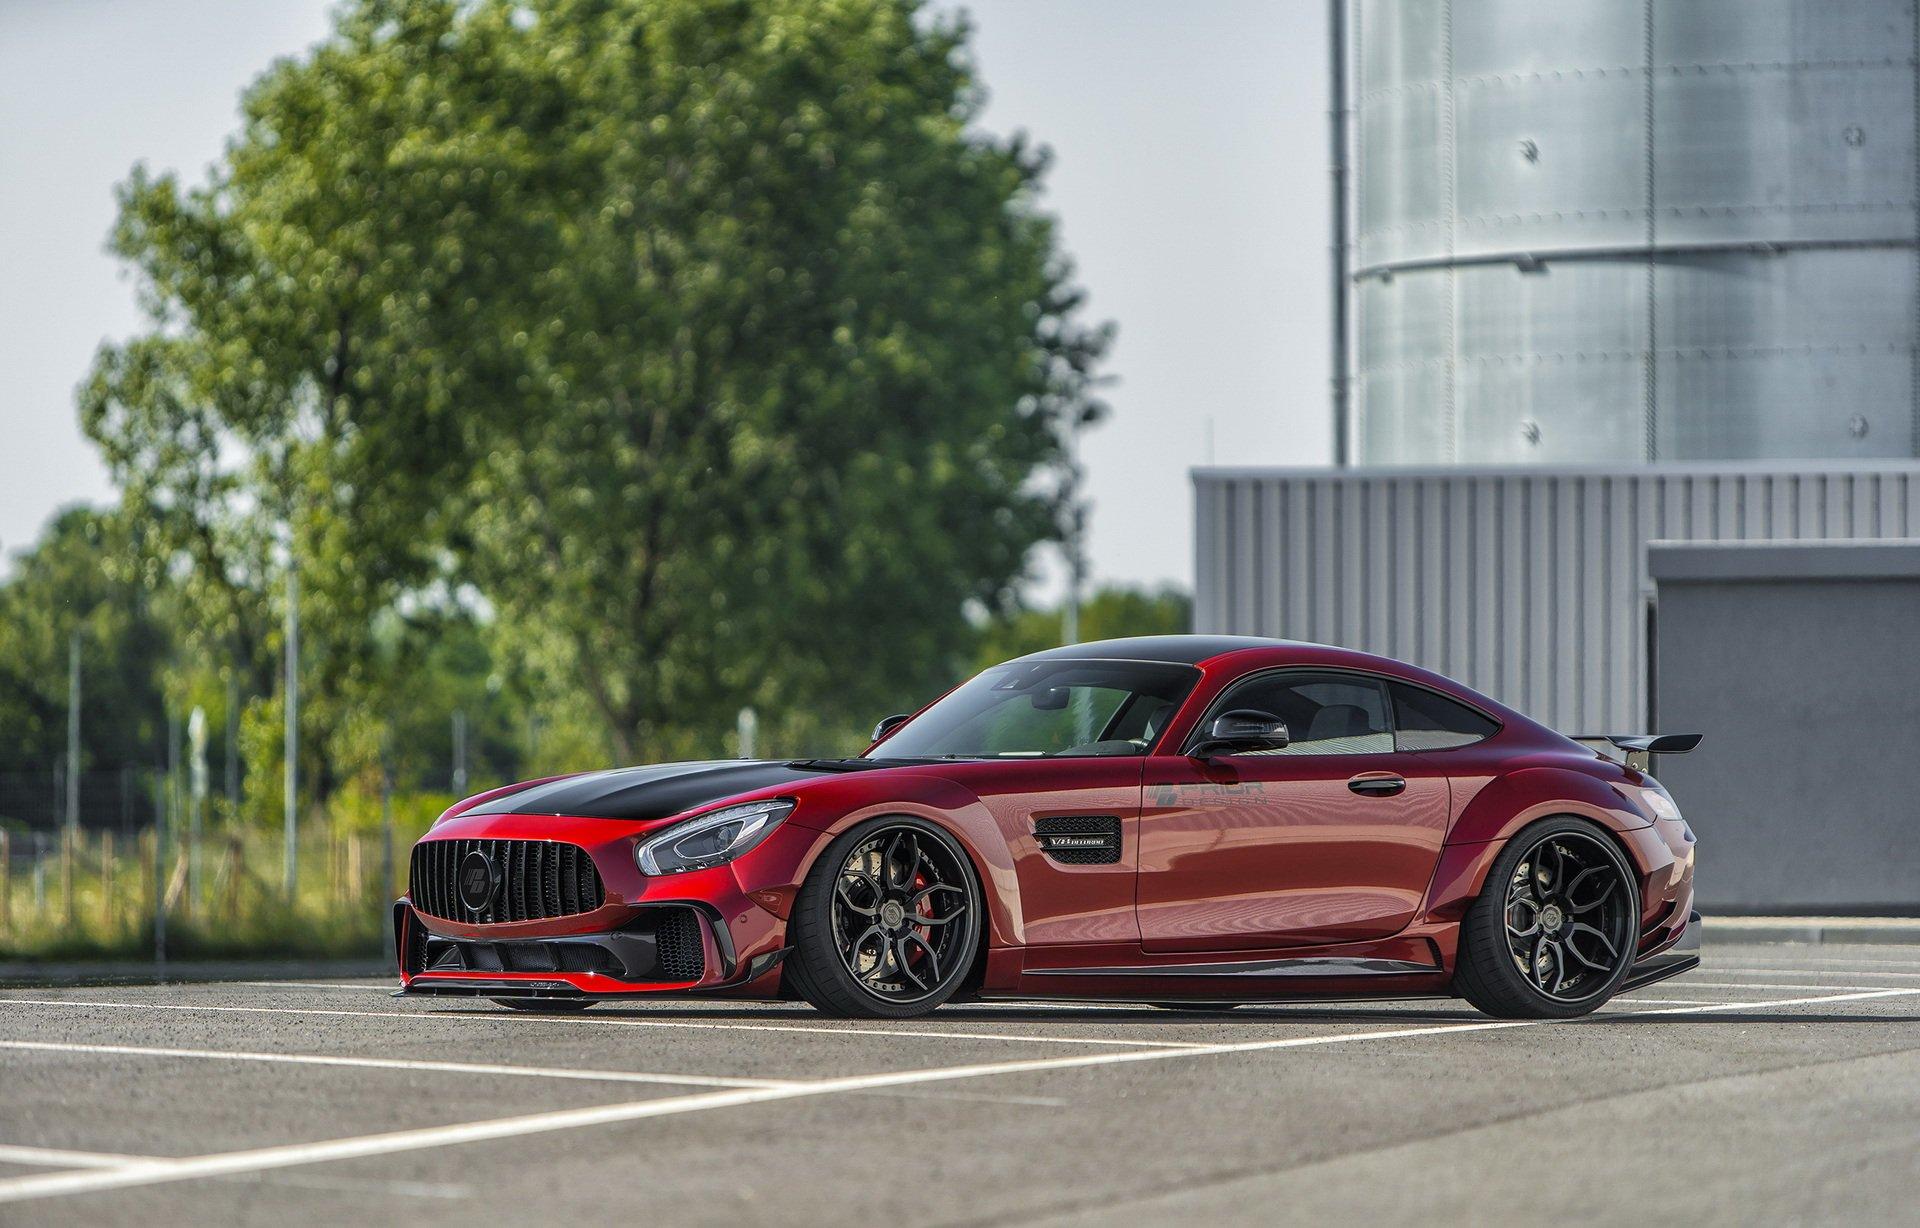 Wajah Bengis Mercedes-AMG GT Versi Prior Design